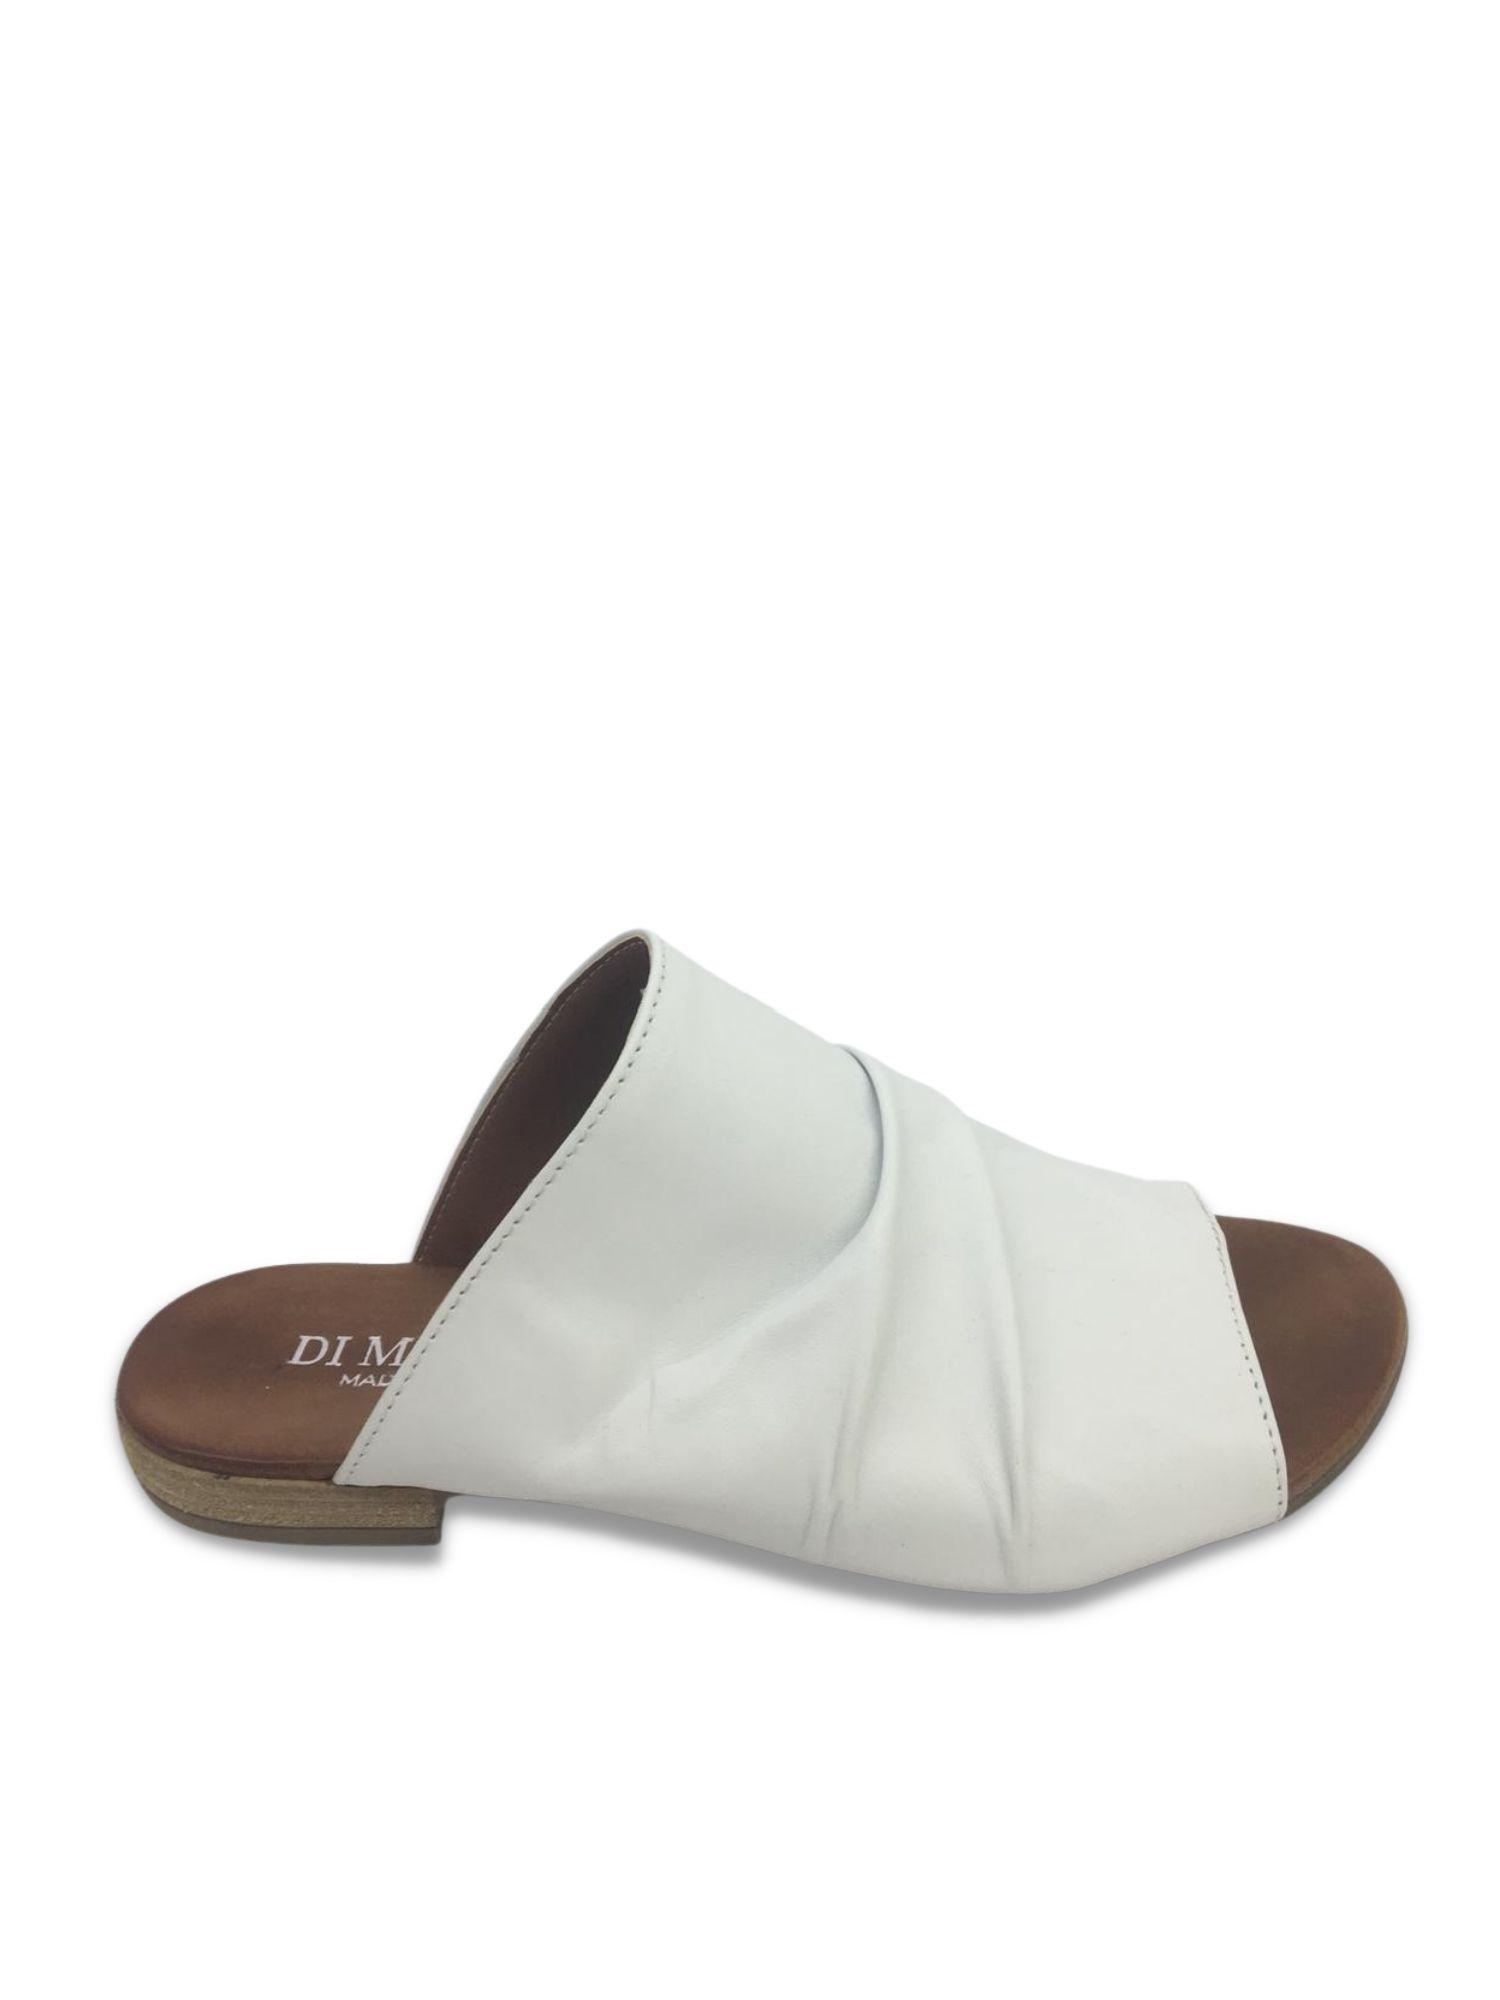 Sandalo Scalzato Made in Italy 207 Bianco